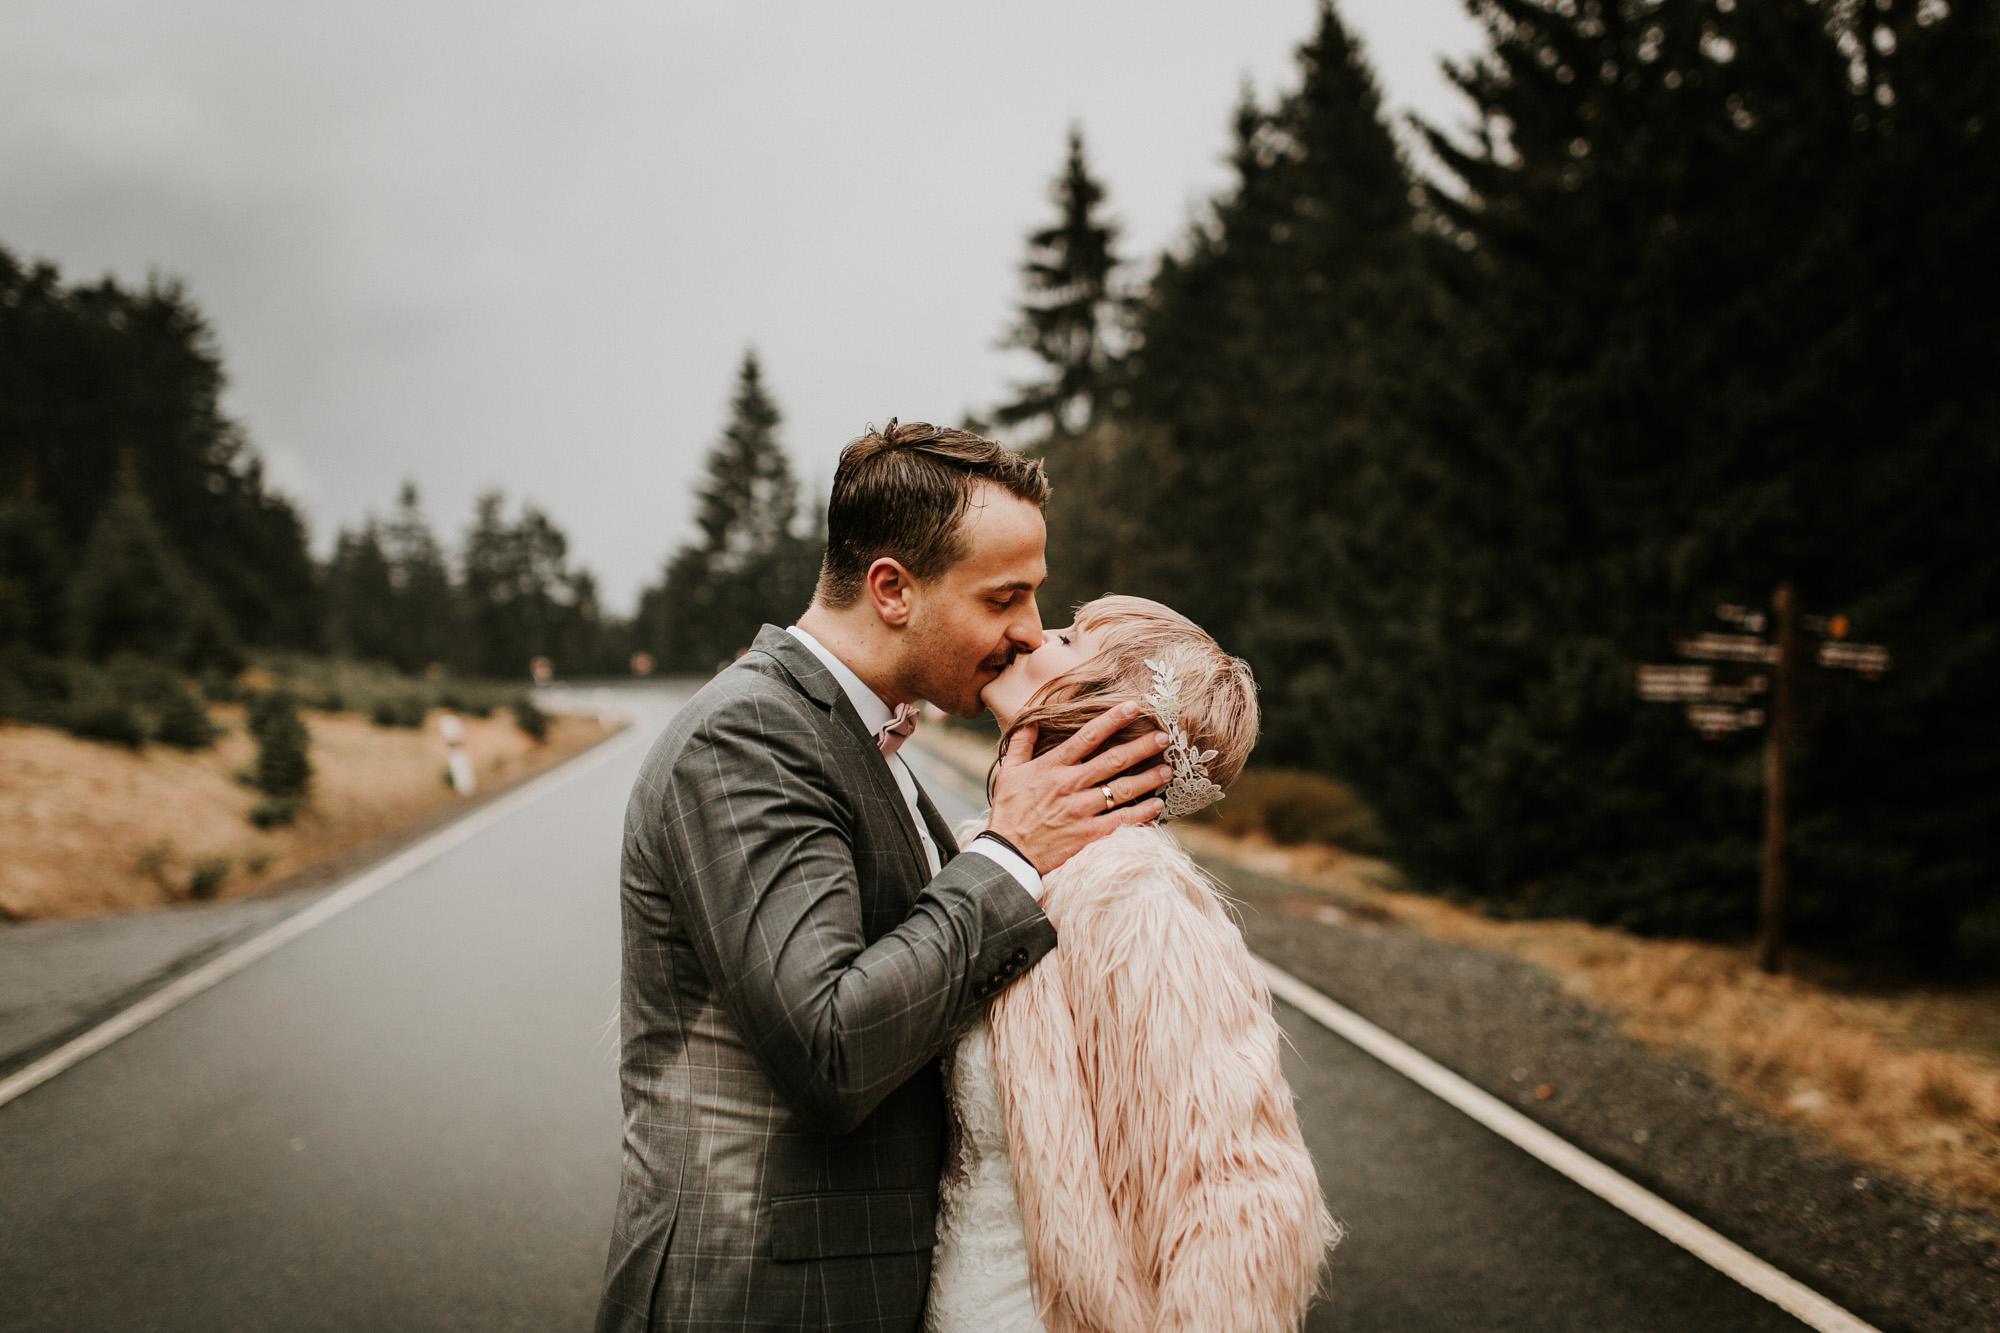 DanielaMarquardtPhotography_Hochzeitsfotograf_Düsseldorf_Köln_Mallorca_Bayern_Austria_Harz_LinaundMaik_Afterwedding-Shooting_Weddingphotographer_Ibiza_Tuskany_Italien_Toskana119